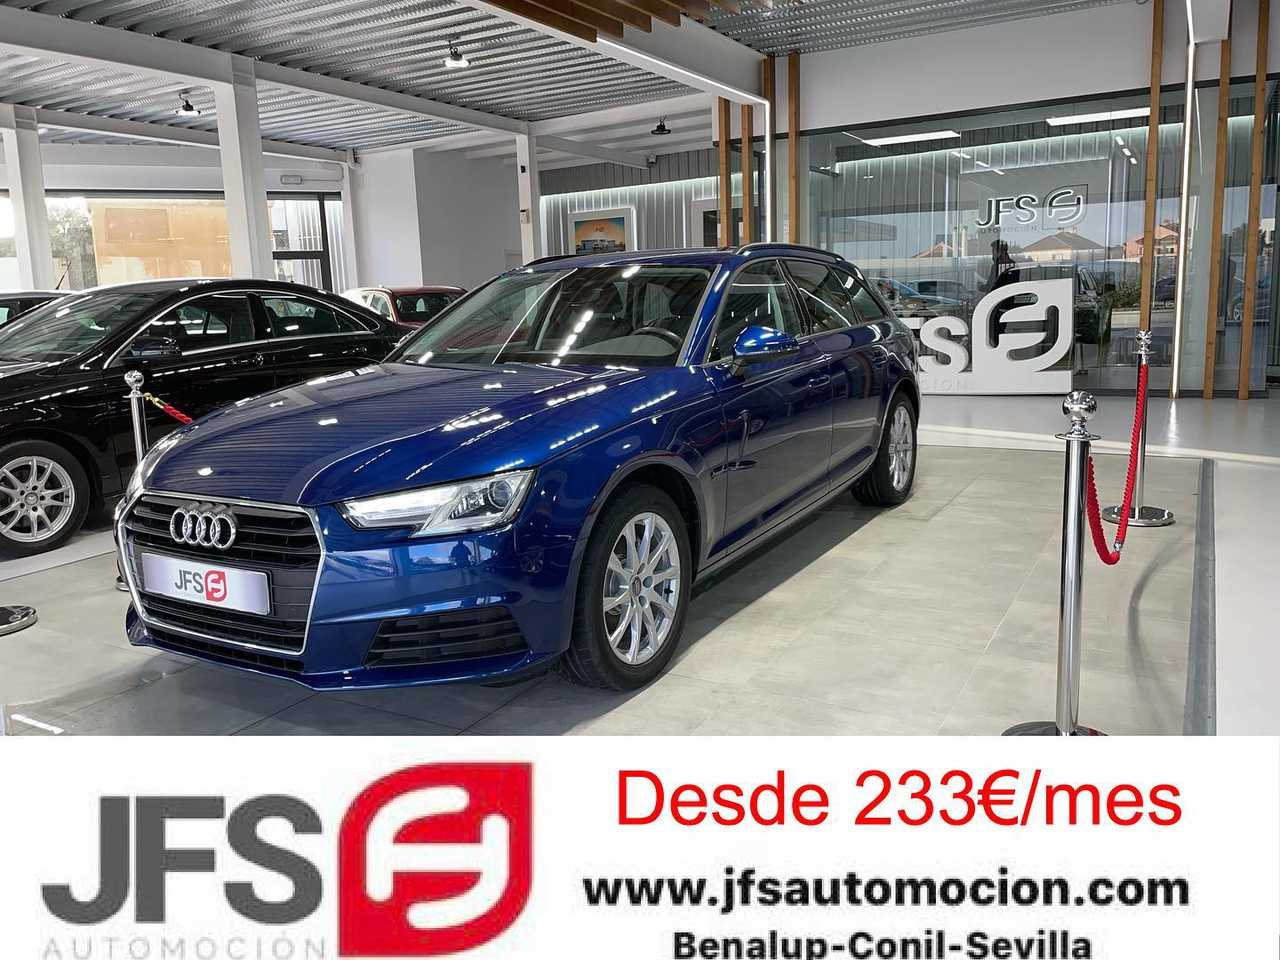 Audi A4 Avant 2.0 TDI 150cv    - Foto 1